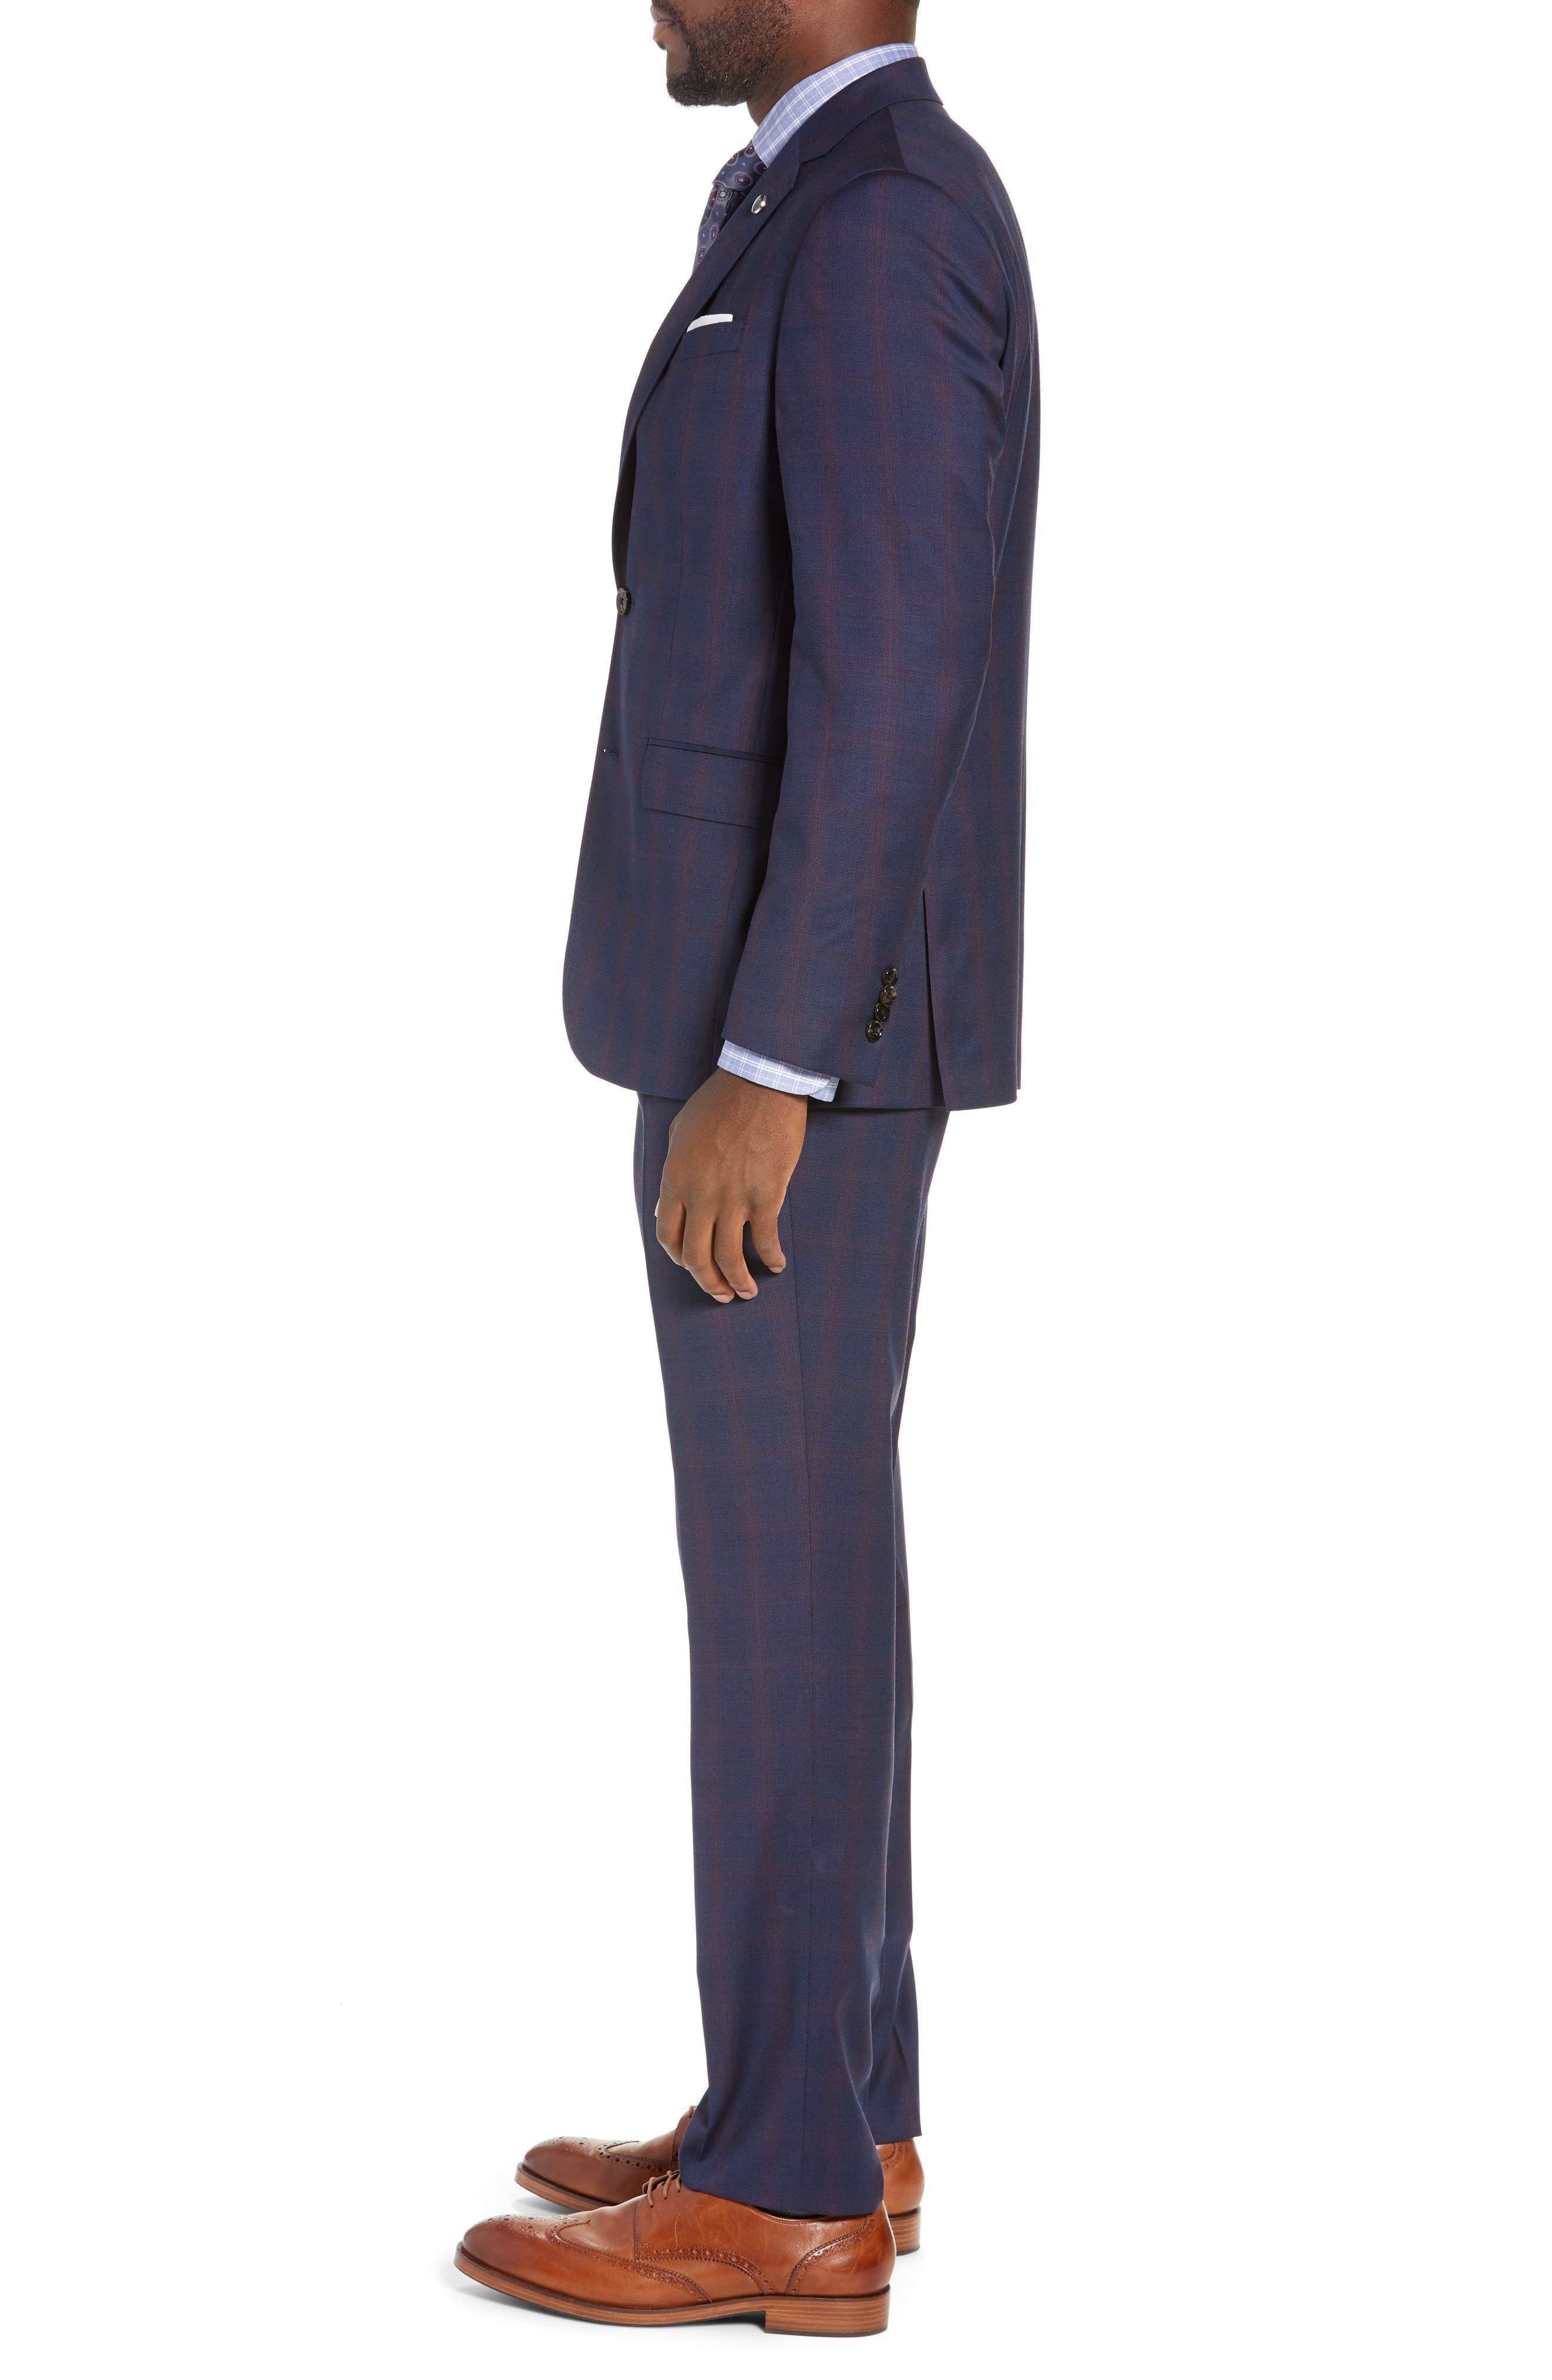 TED BAKER LONDON,                             Roger Slim Fit Plaid Wool Suit,                             Alternate thumbnail 3, color,                             NAVY